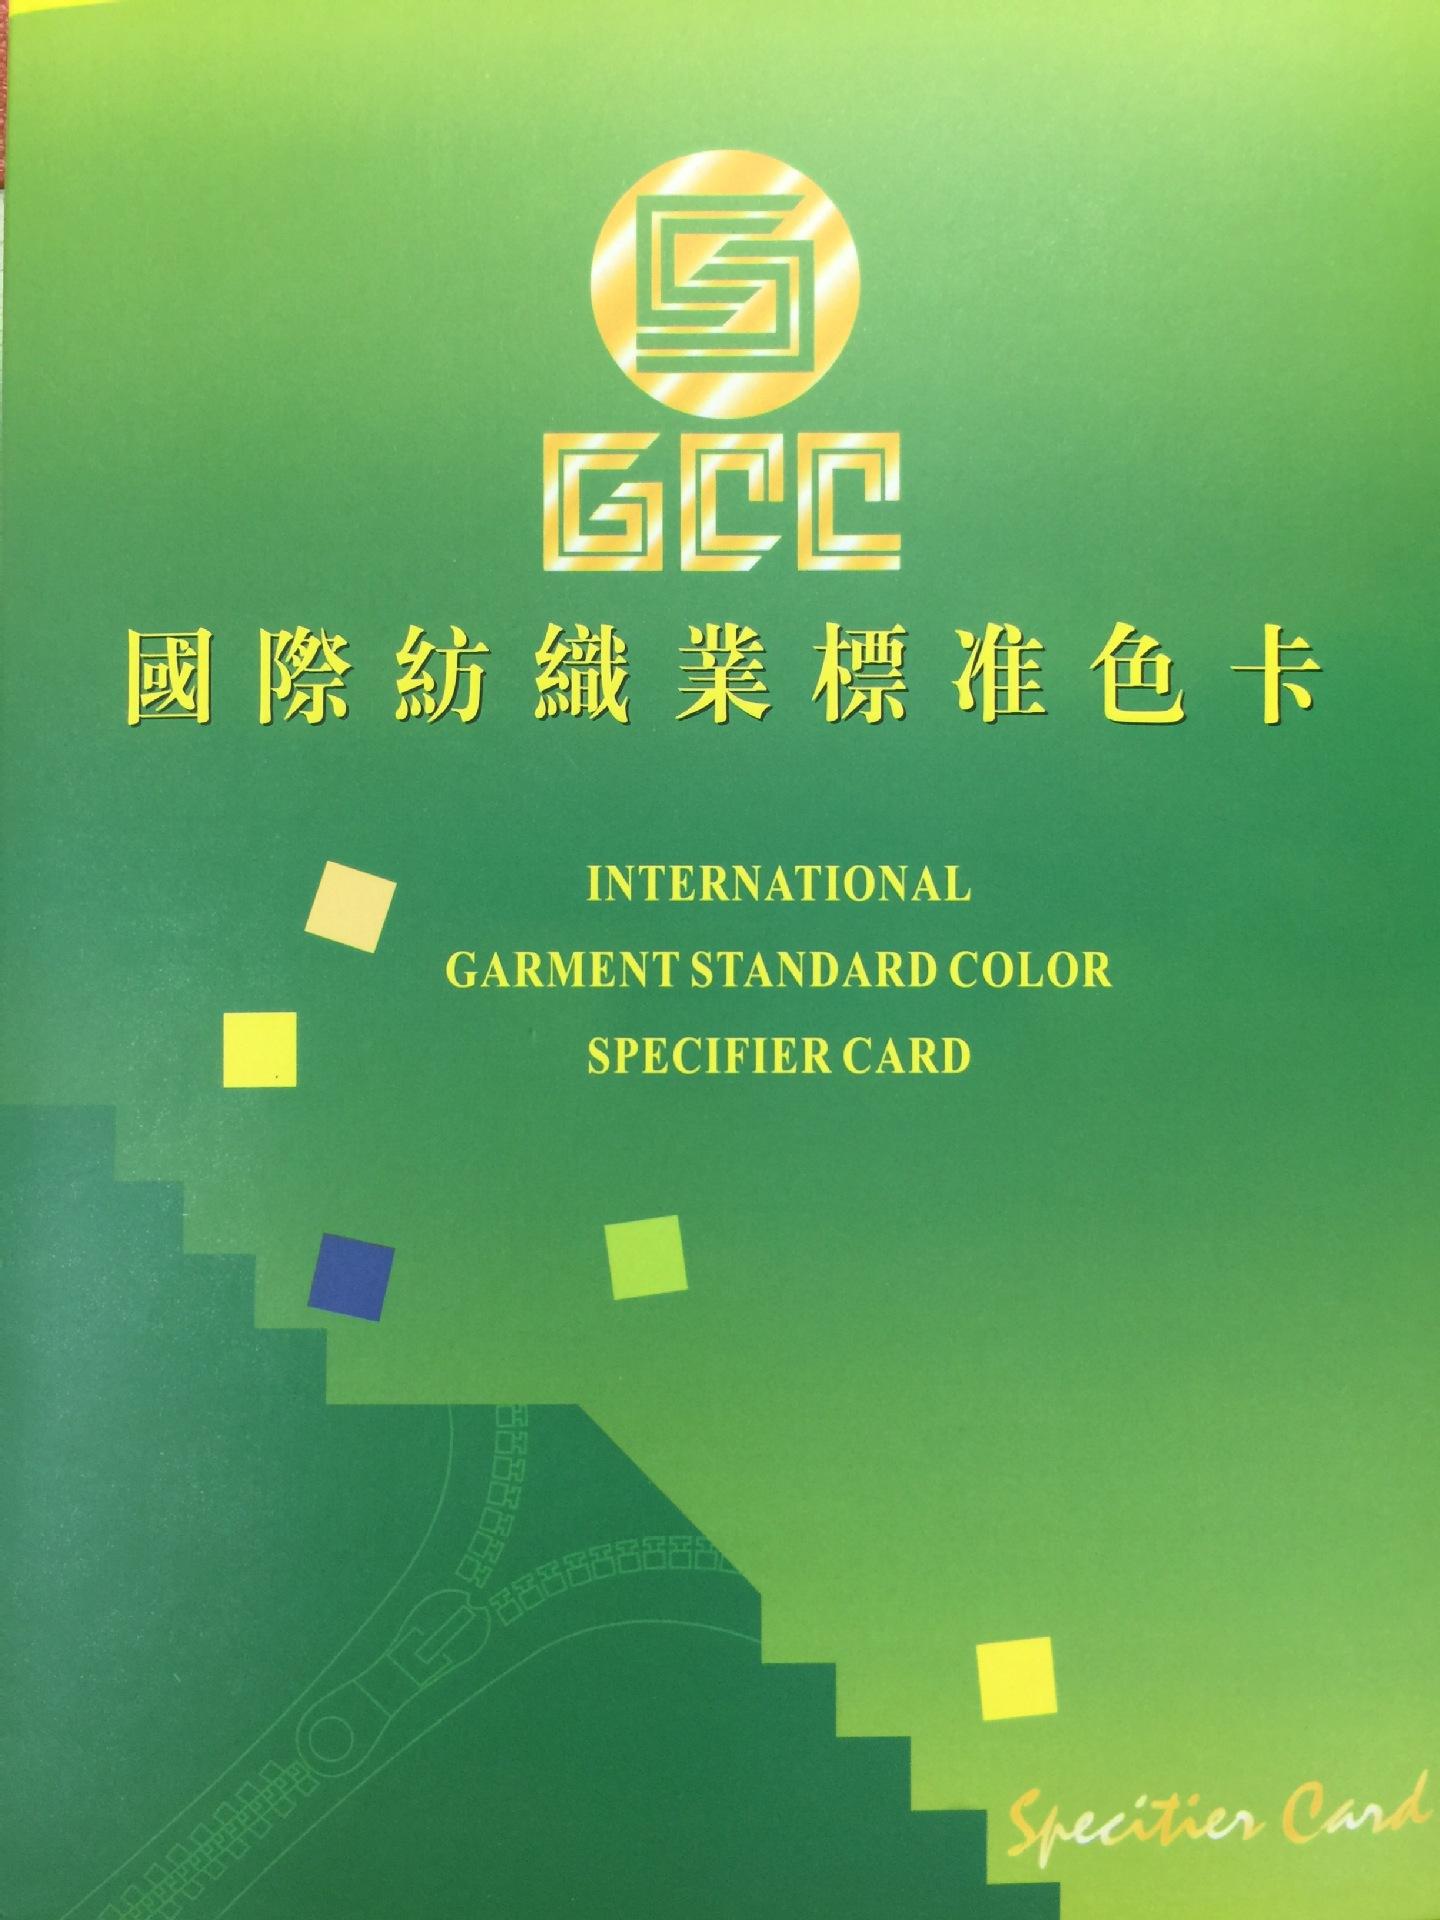 GCC国内纺织业 GCC 拉链花边服装辅料纺织业